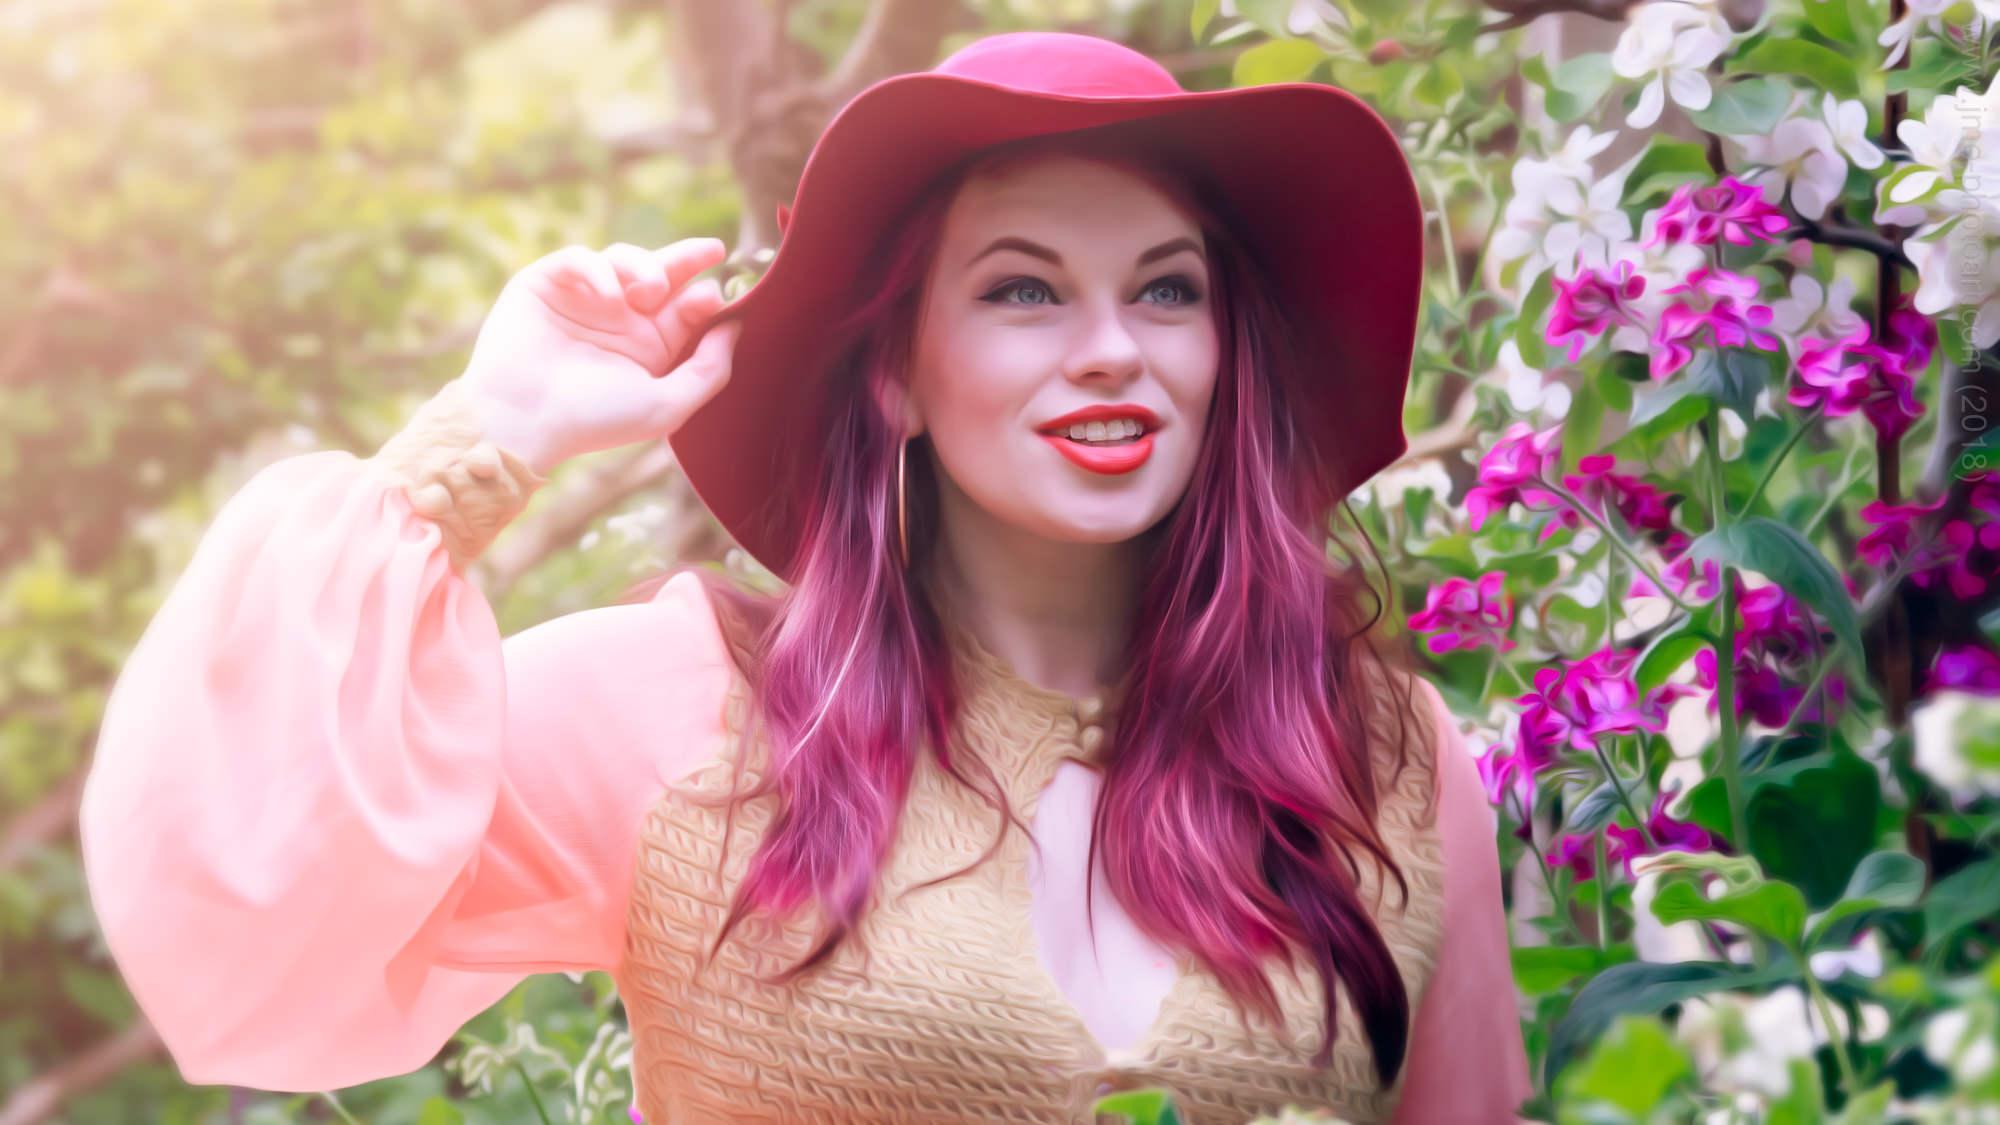 'Electric Red' - Model : Becky Bennett  April 2017